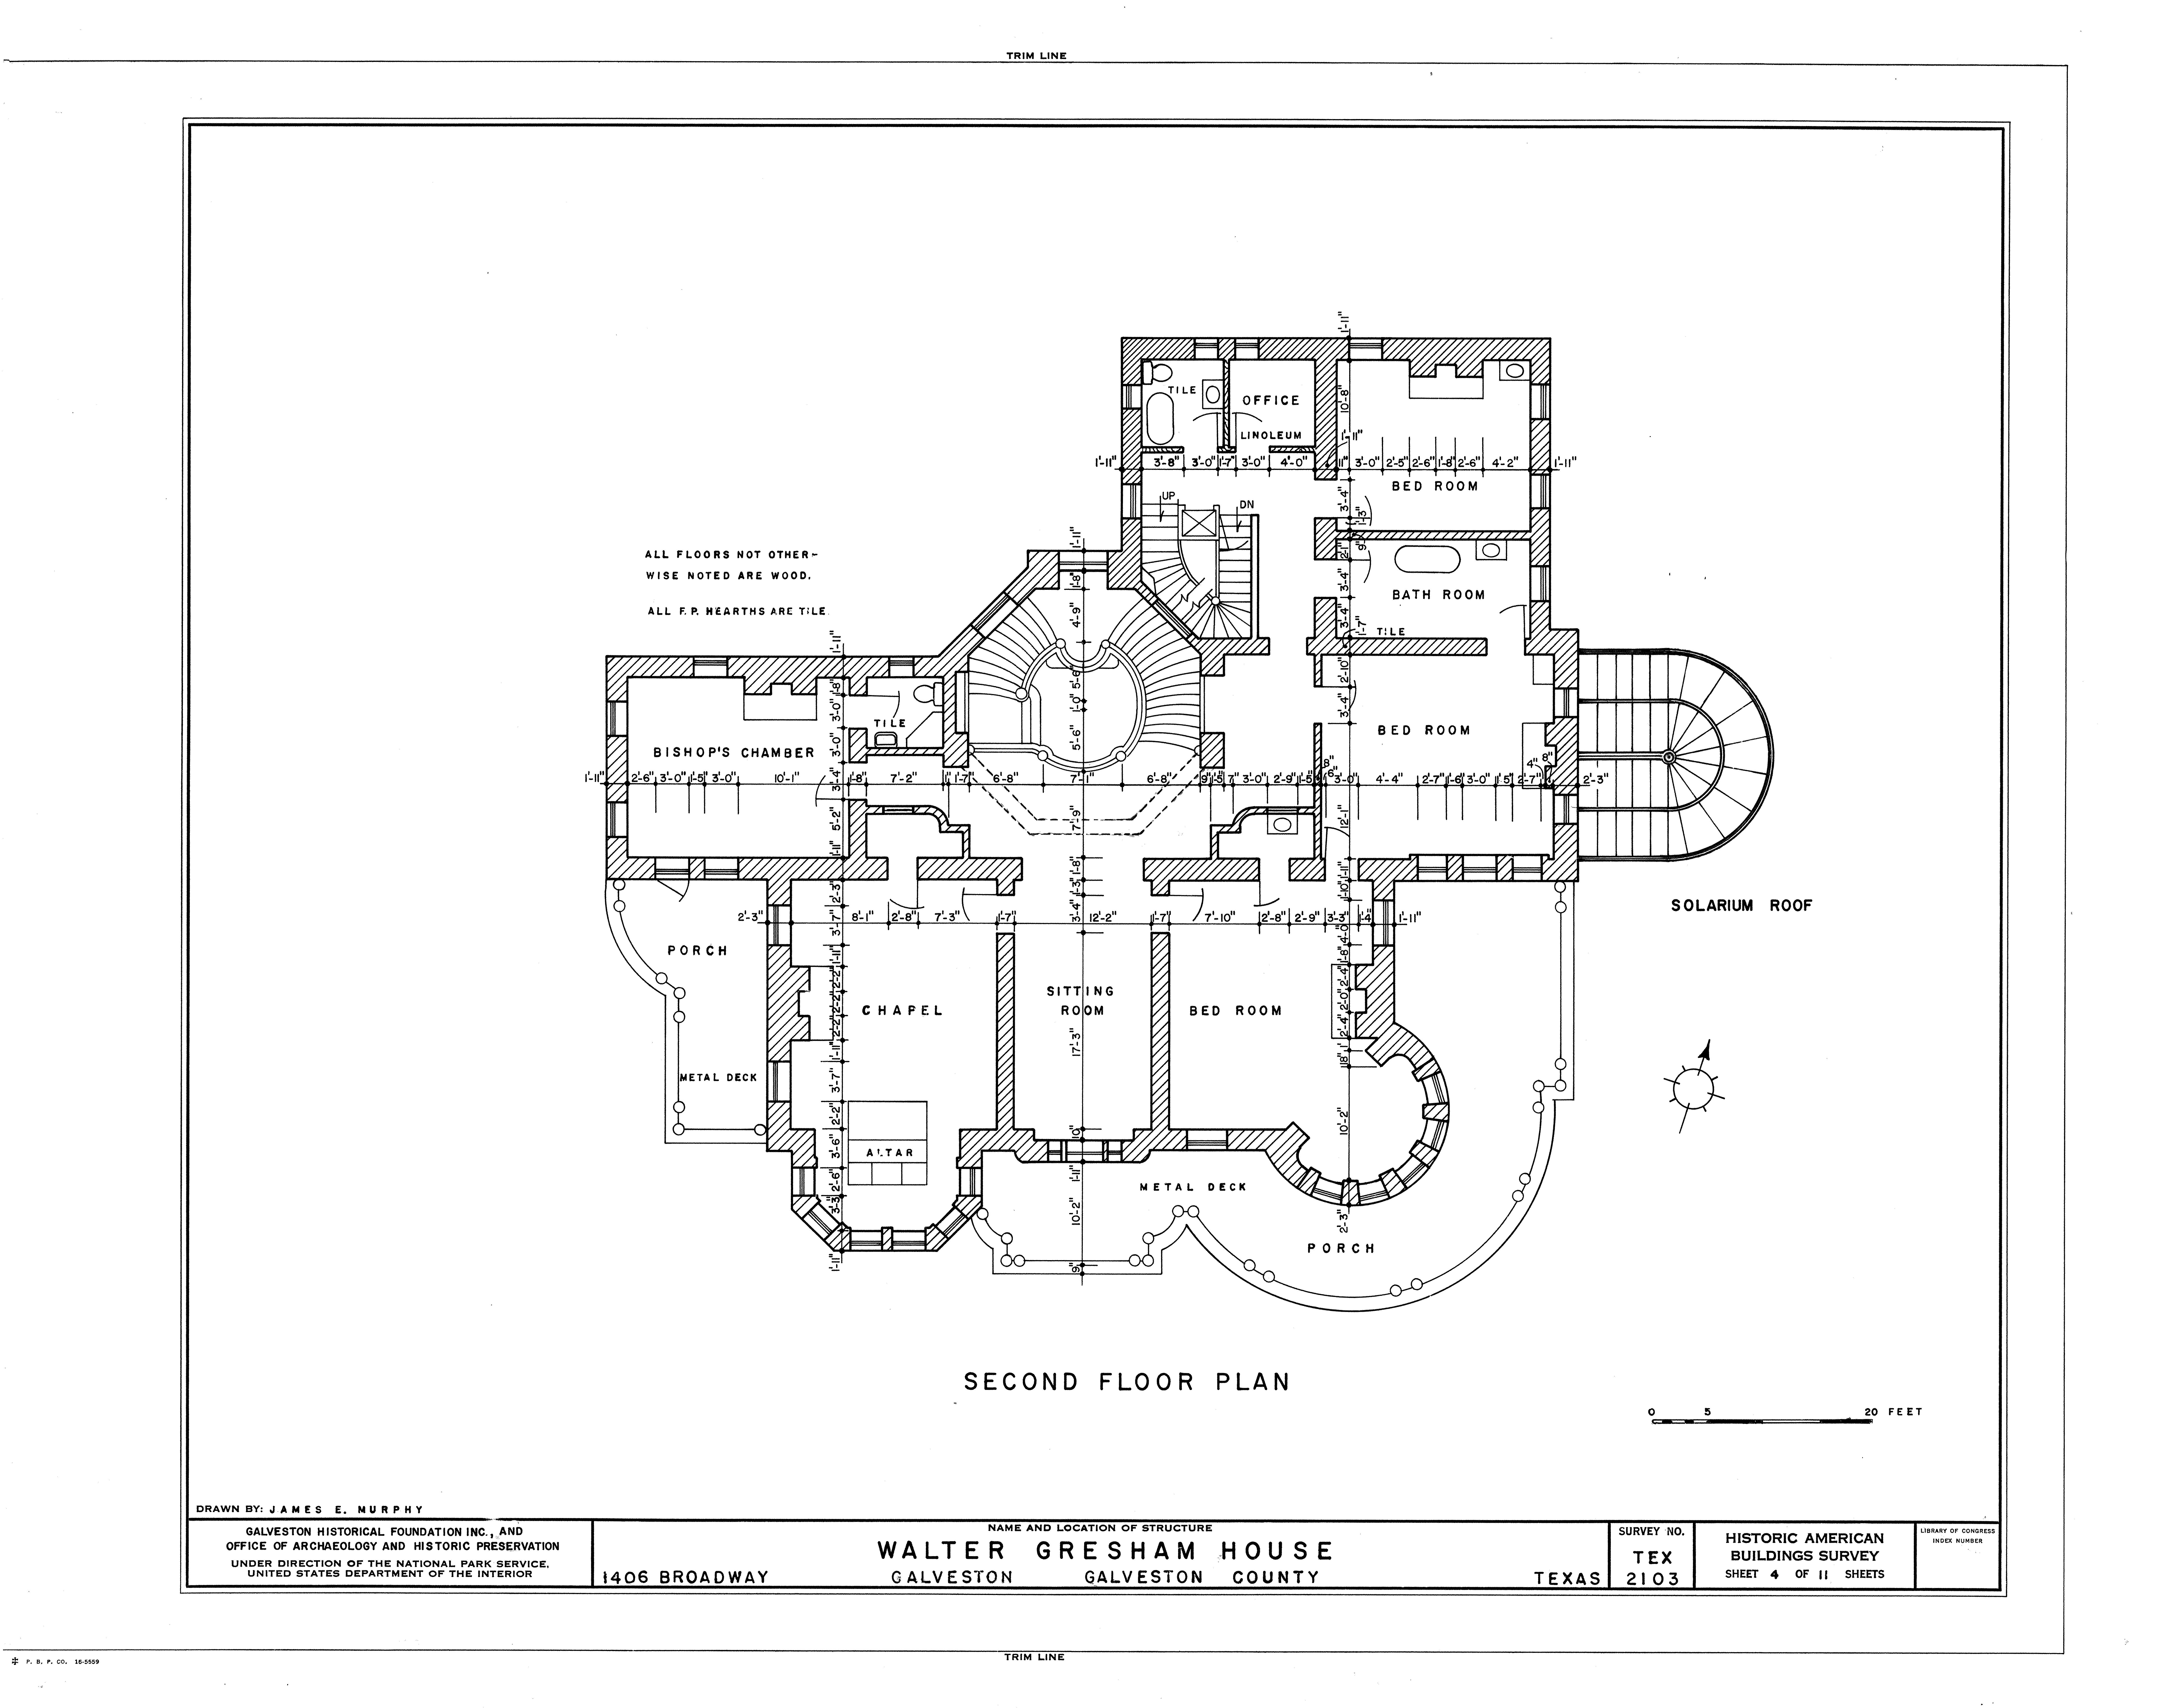 Delightful File:Colonel Walter Gresham House, 1402 Broadway, Galveston, Galveston  County, TX